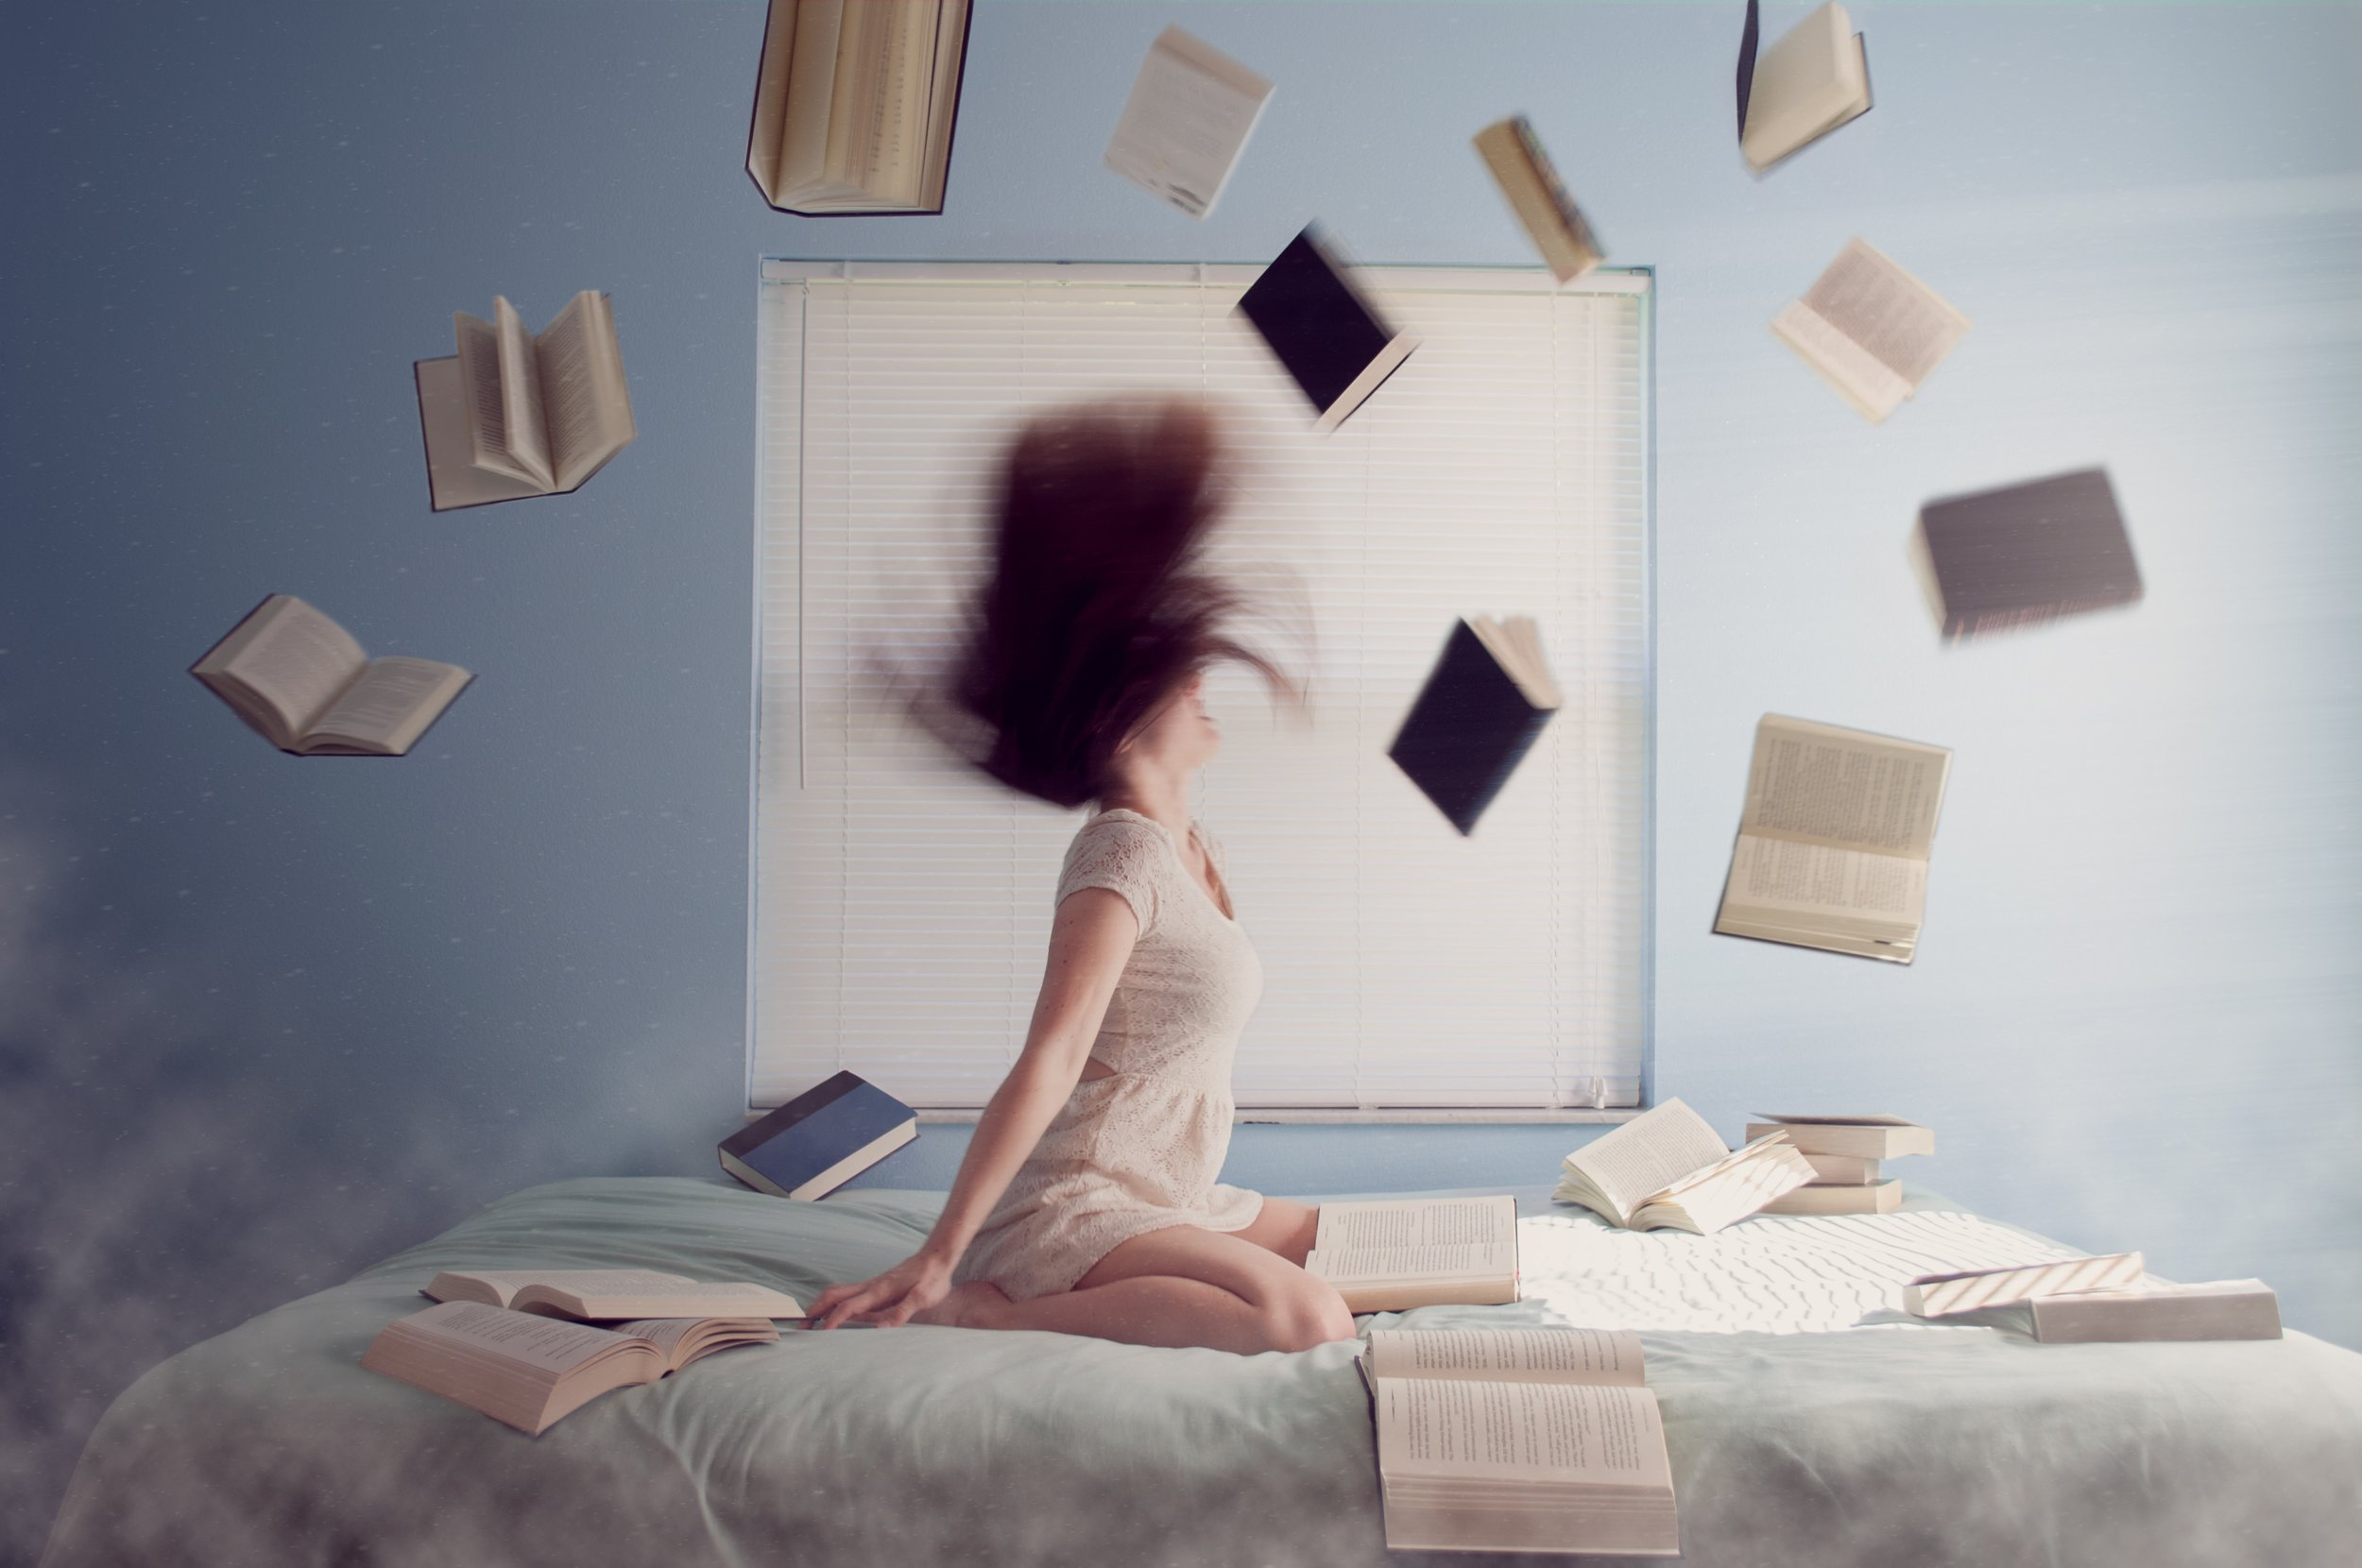 Self-Help books to help personal development